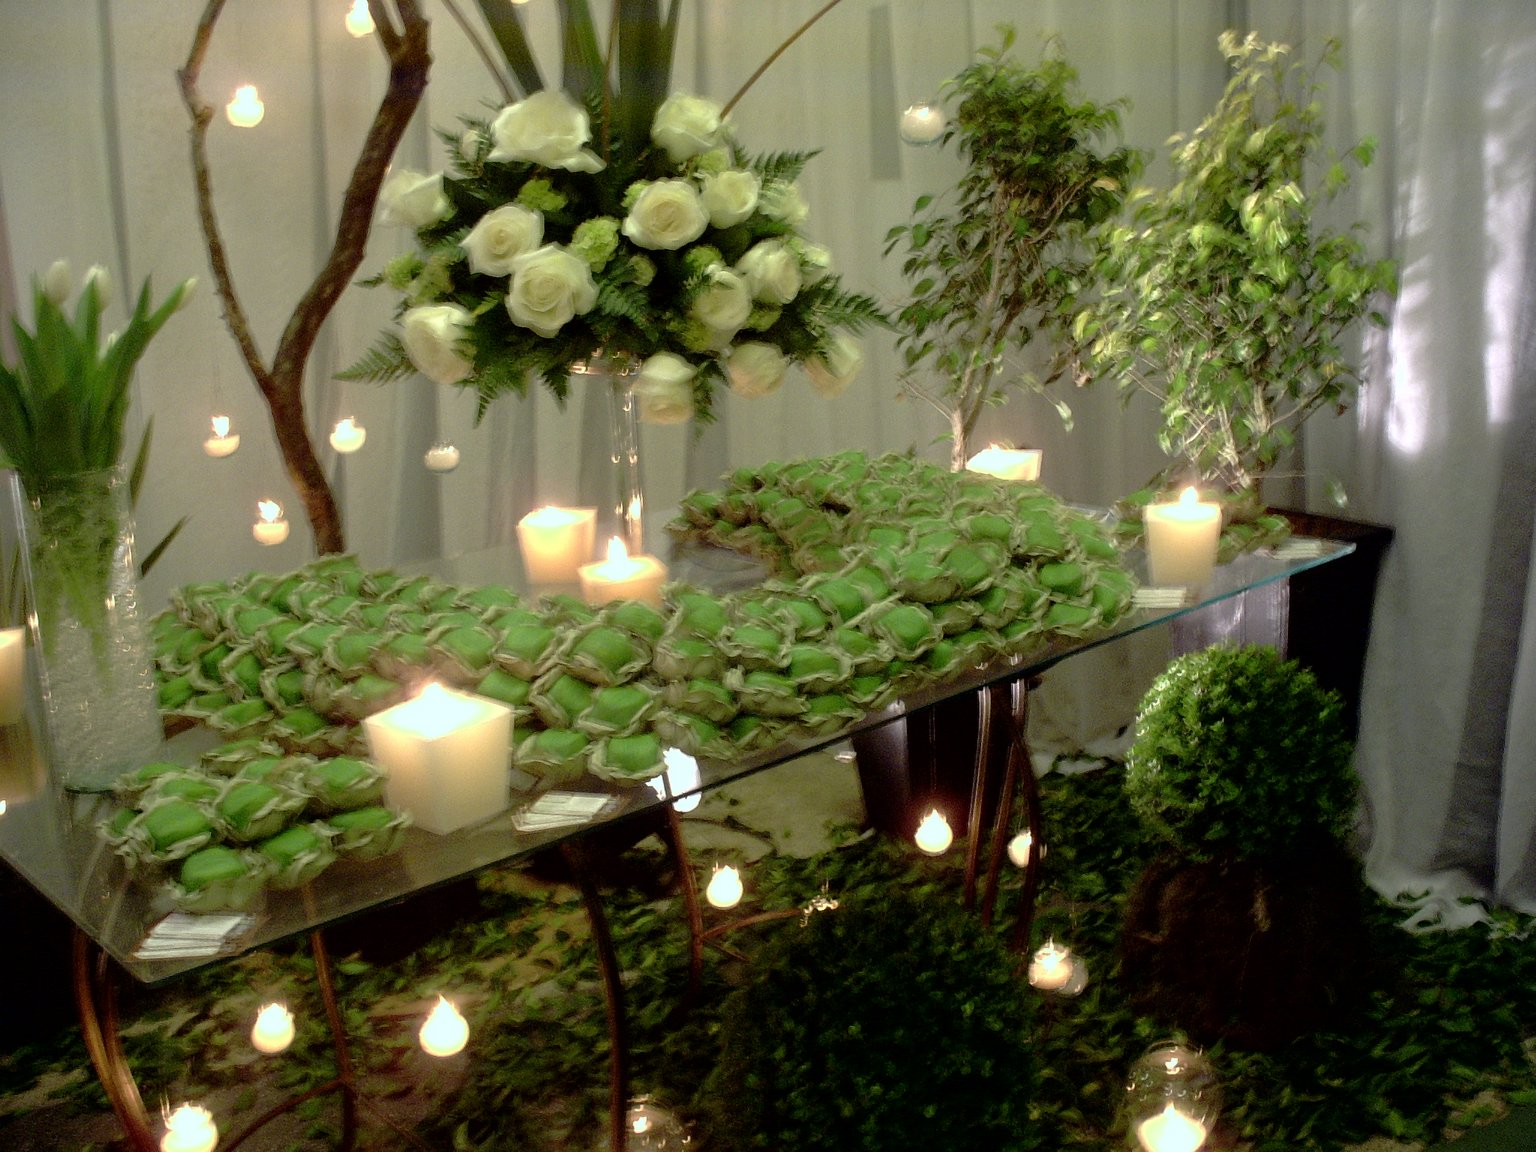 La sabore mesas decorativas com bem casados - Mesas decorativas ...